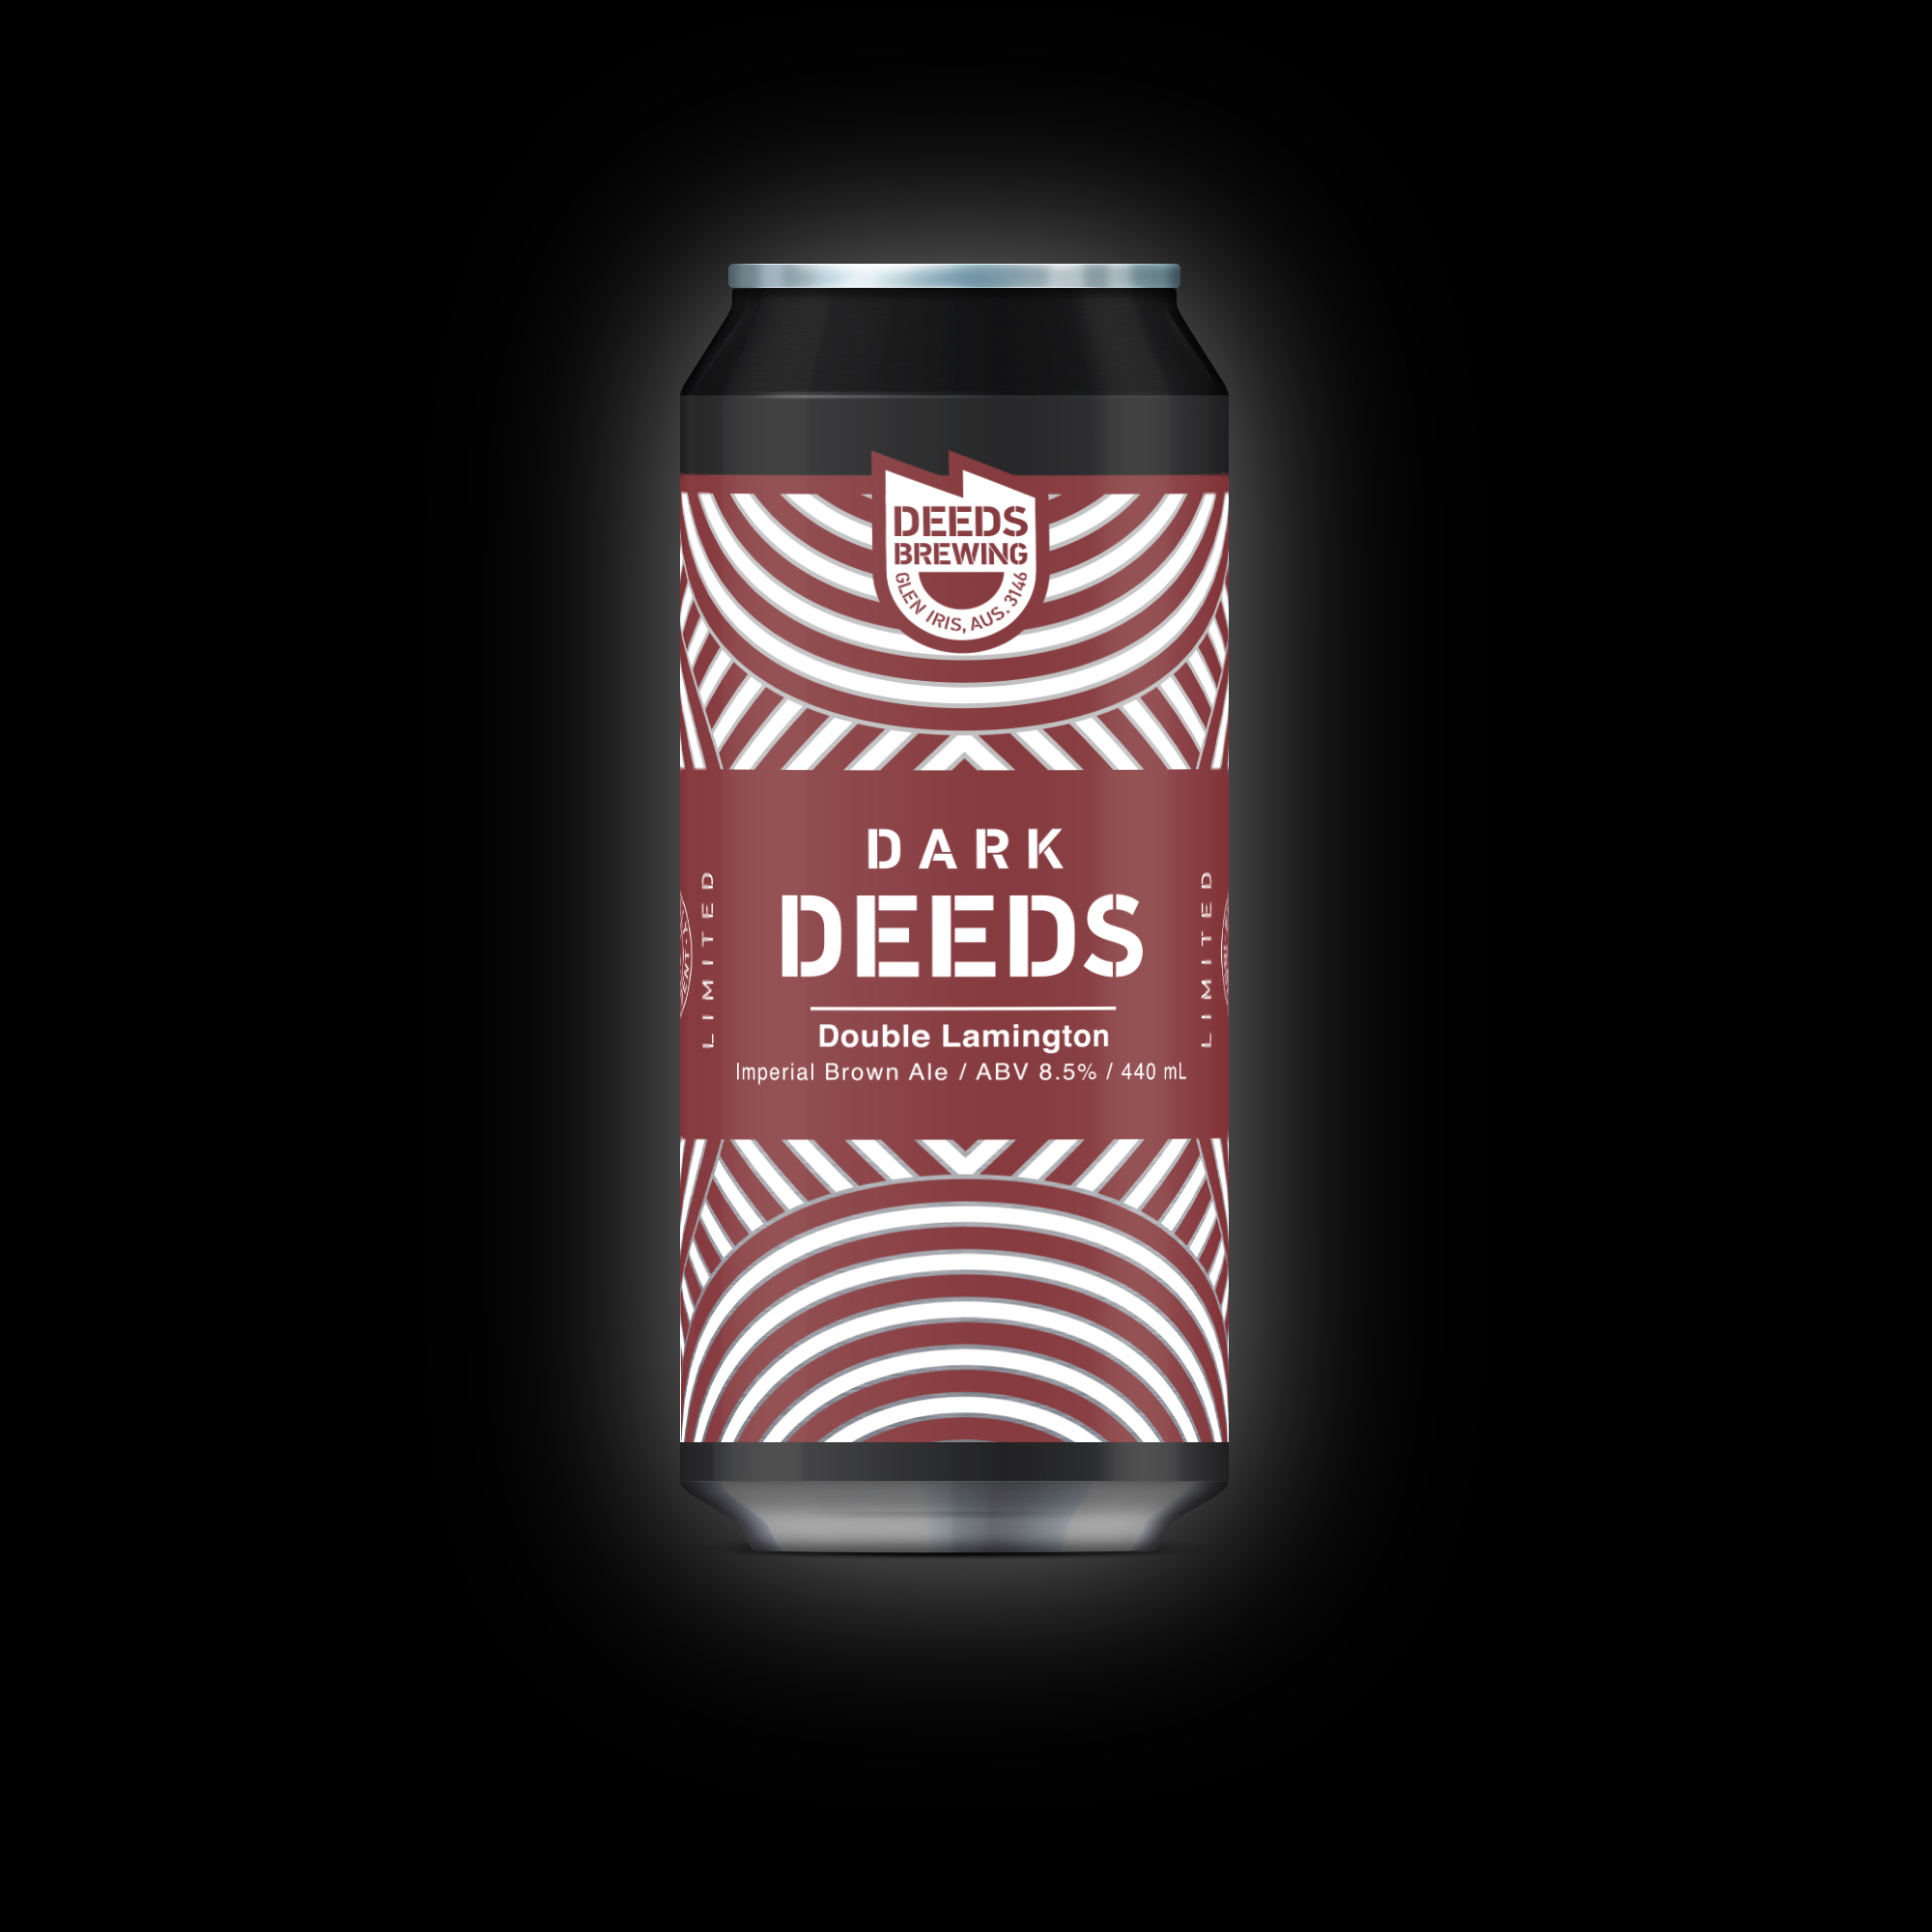 Double Lamington part of the Dark Deeds Series